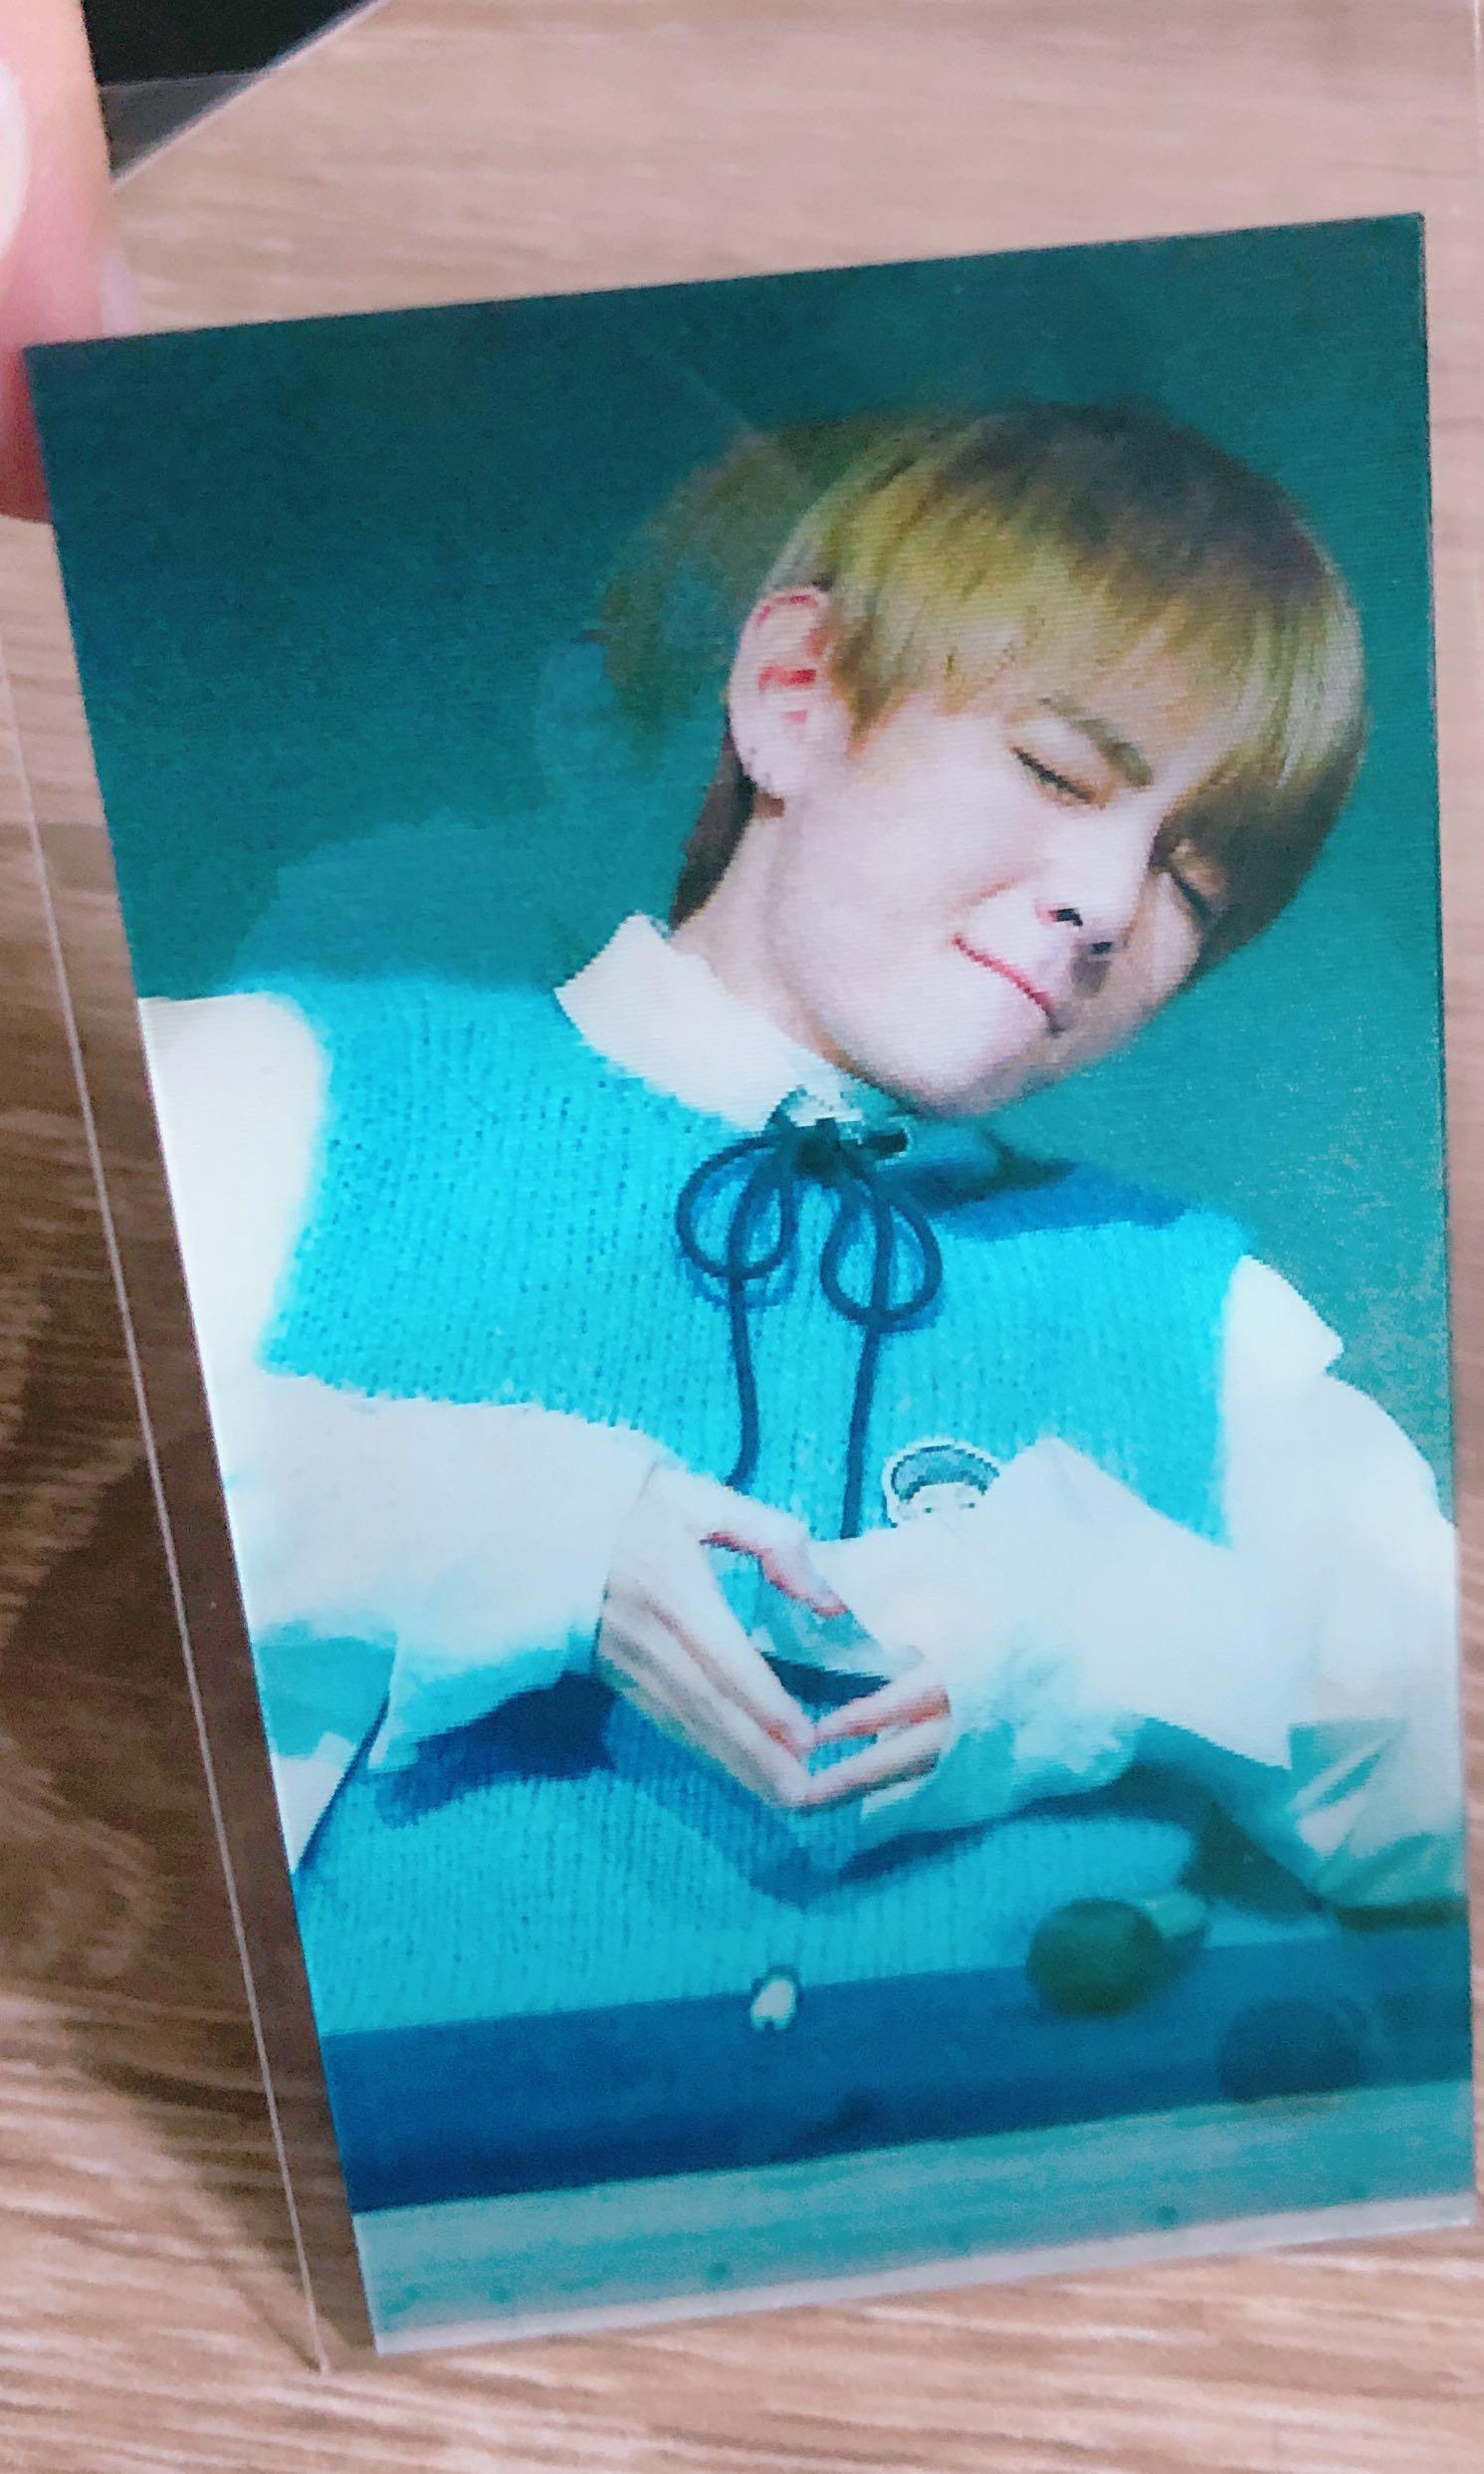 Taekook Lenticular Card Emw Hologram Stickers Post Cards K Pop Power Bank Exo Bts Bangtan Boys 5000mha Entertainment Wave On Carousell